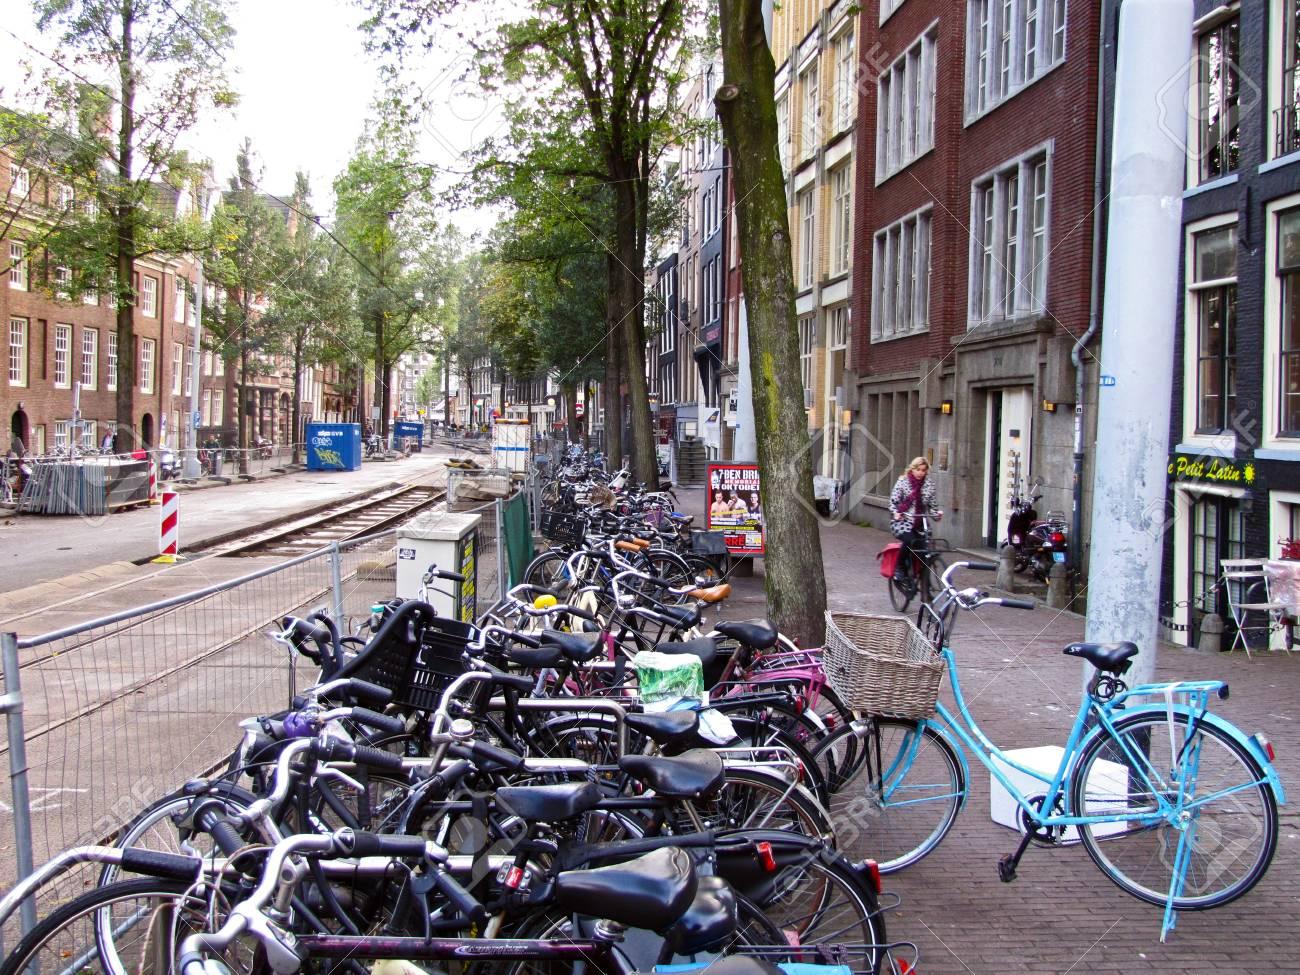 Bikes in Amsterdam - 34359778